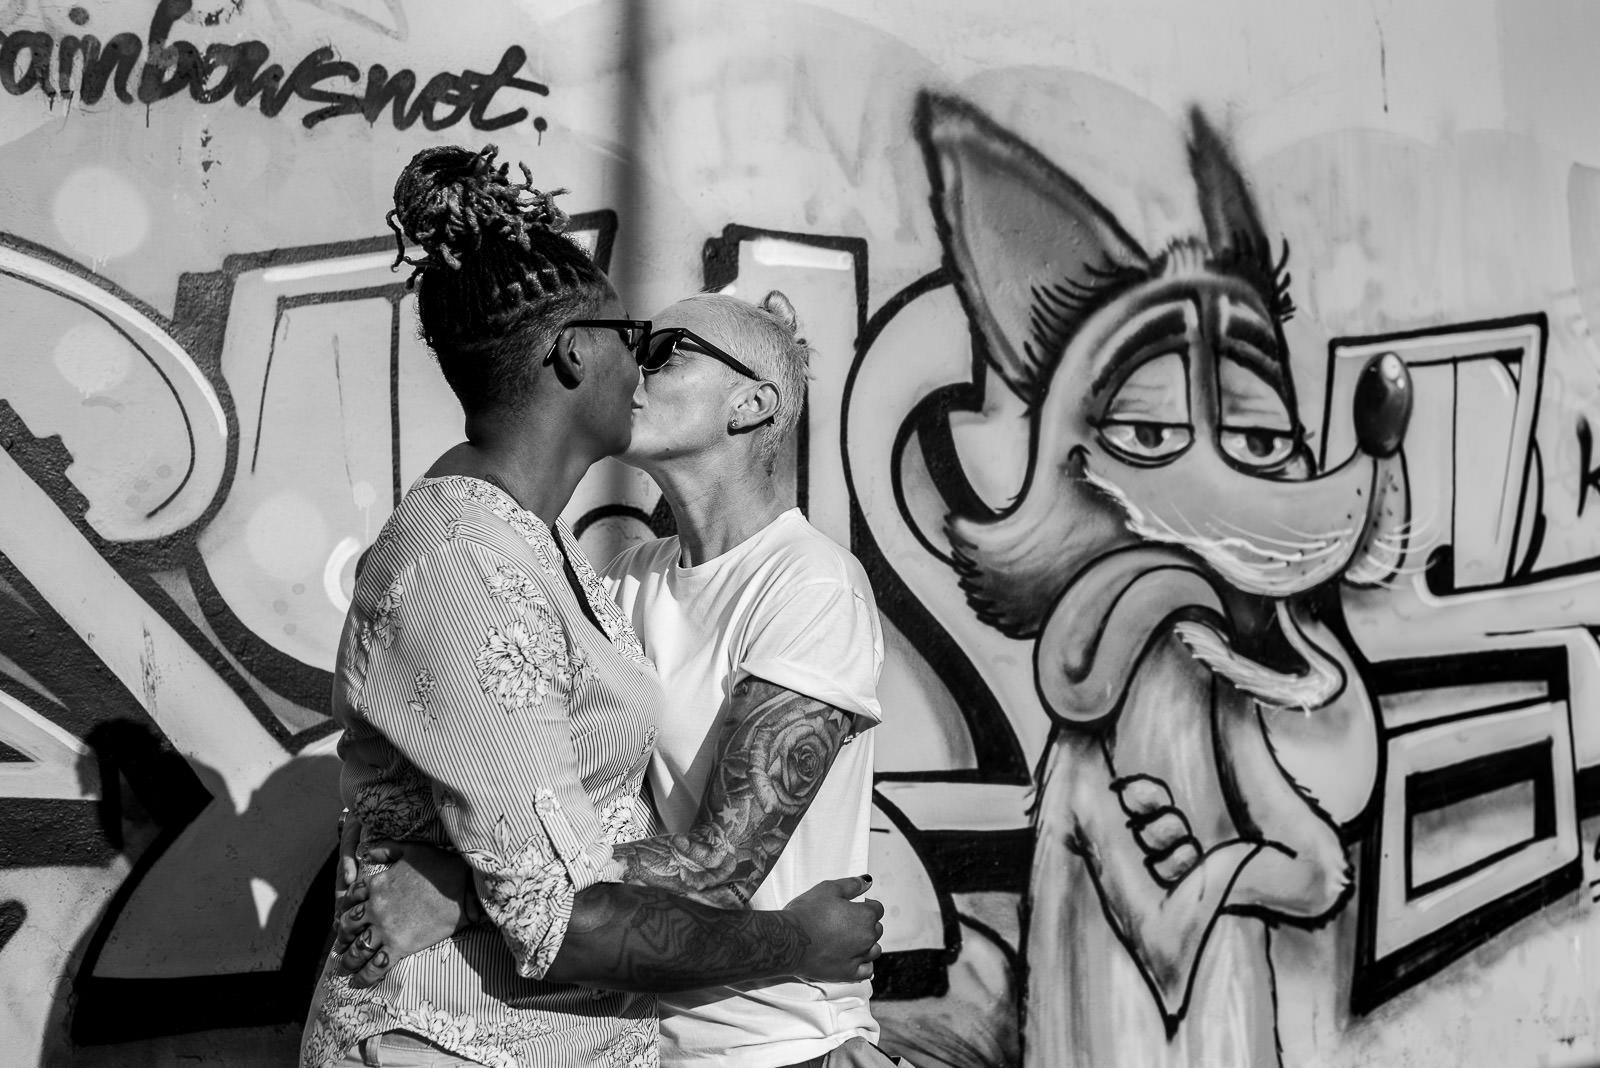 lesbians kissing next to a grafiti